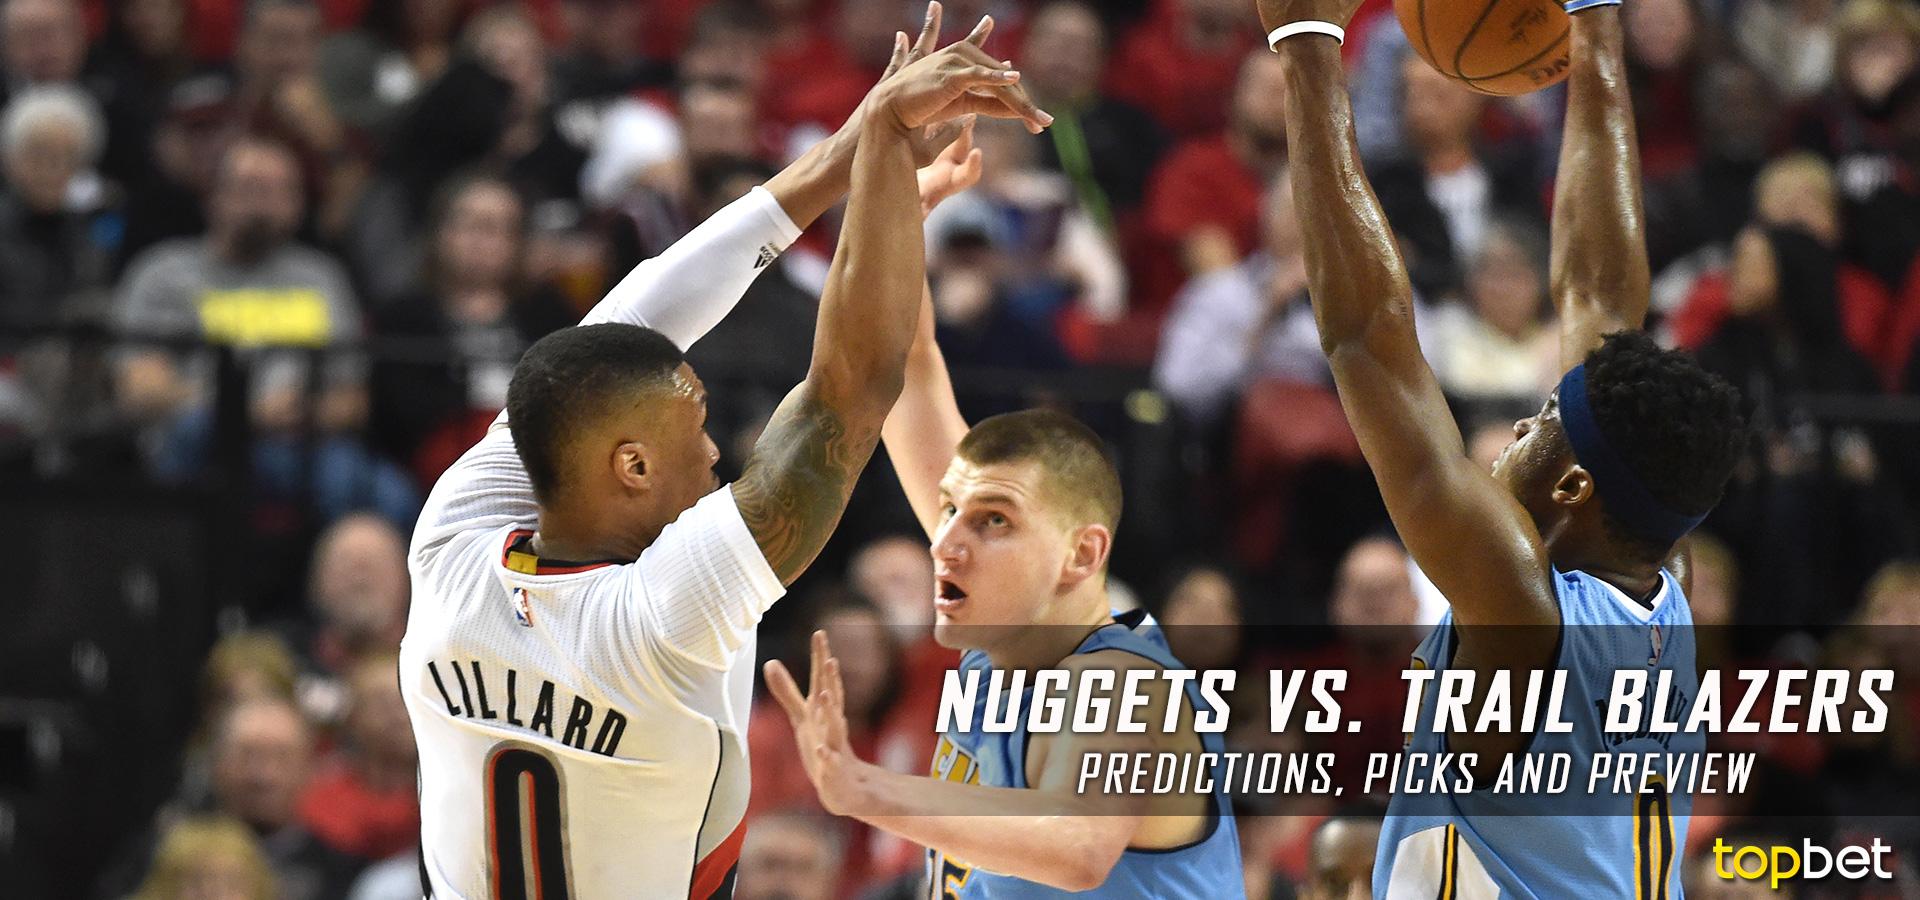 NBA Playoffs 2019: Watch Nuggets vs. Trail Blazers Game 3